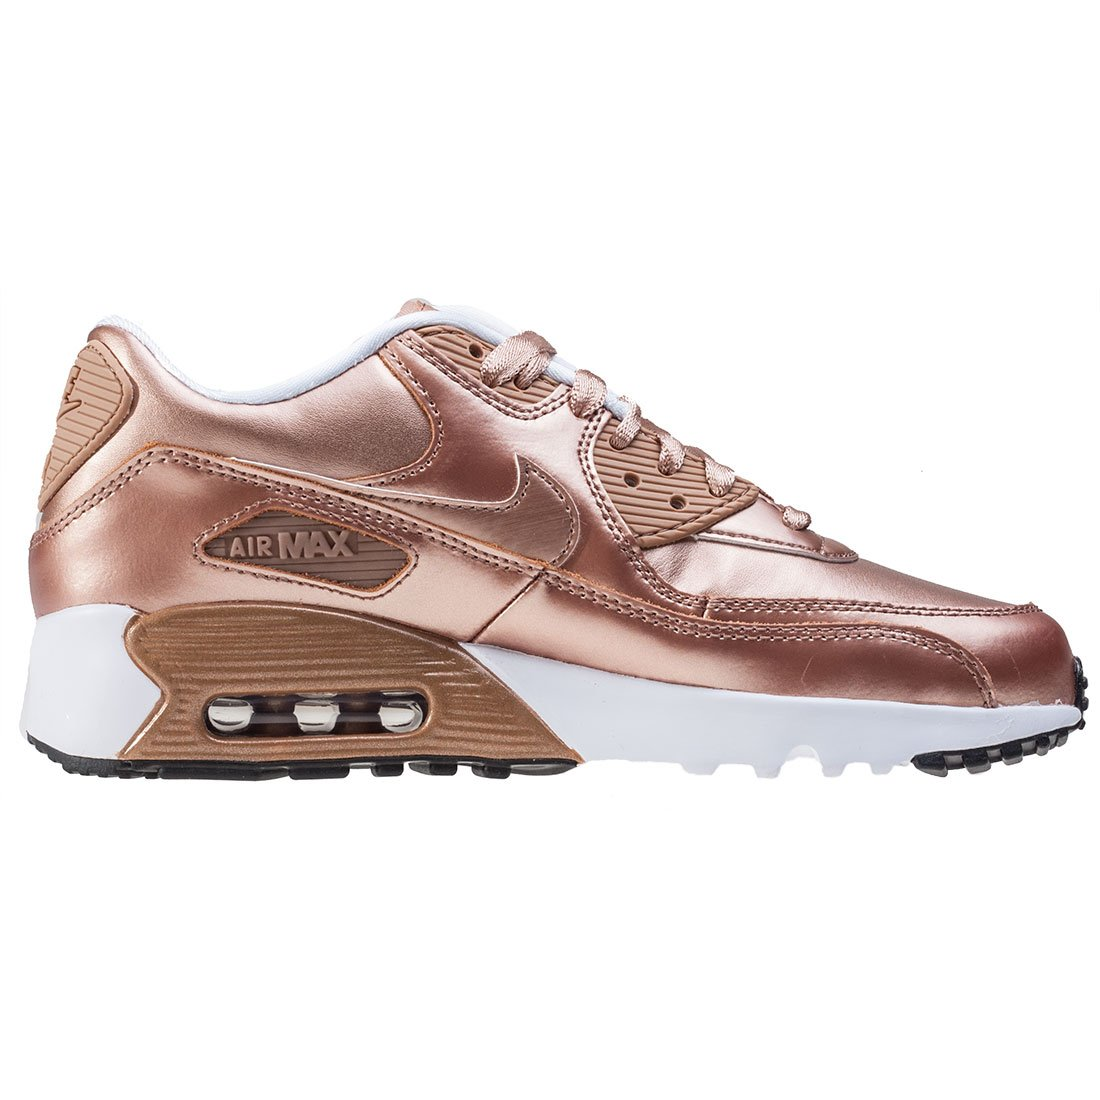 Cheap Nike Air Max 90 Se Leather Gs Bronze Pack Schuhe Damen